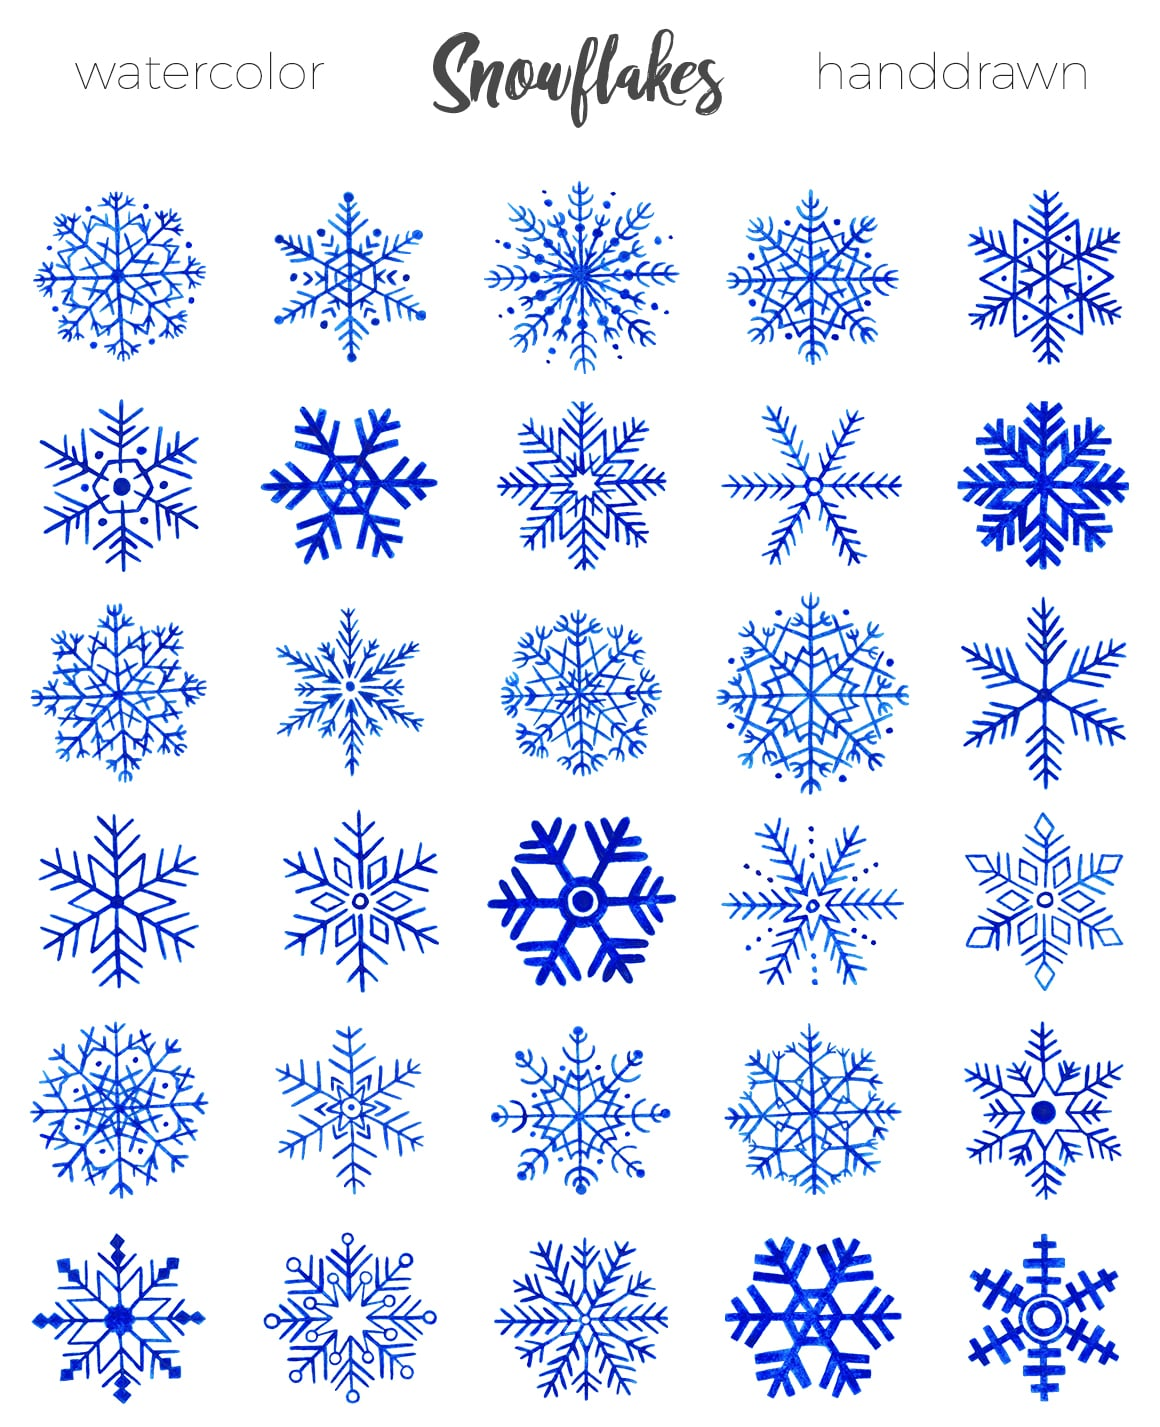 Unique hand drawn snowflakes just master bundles